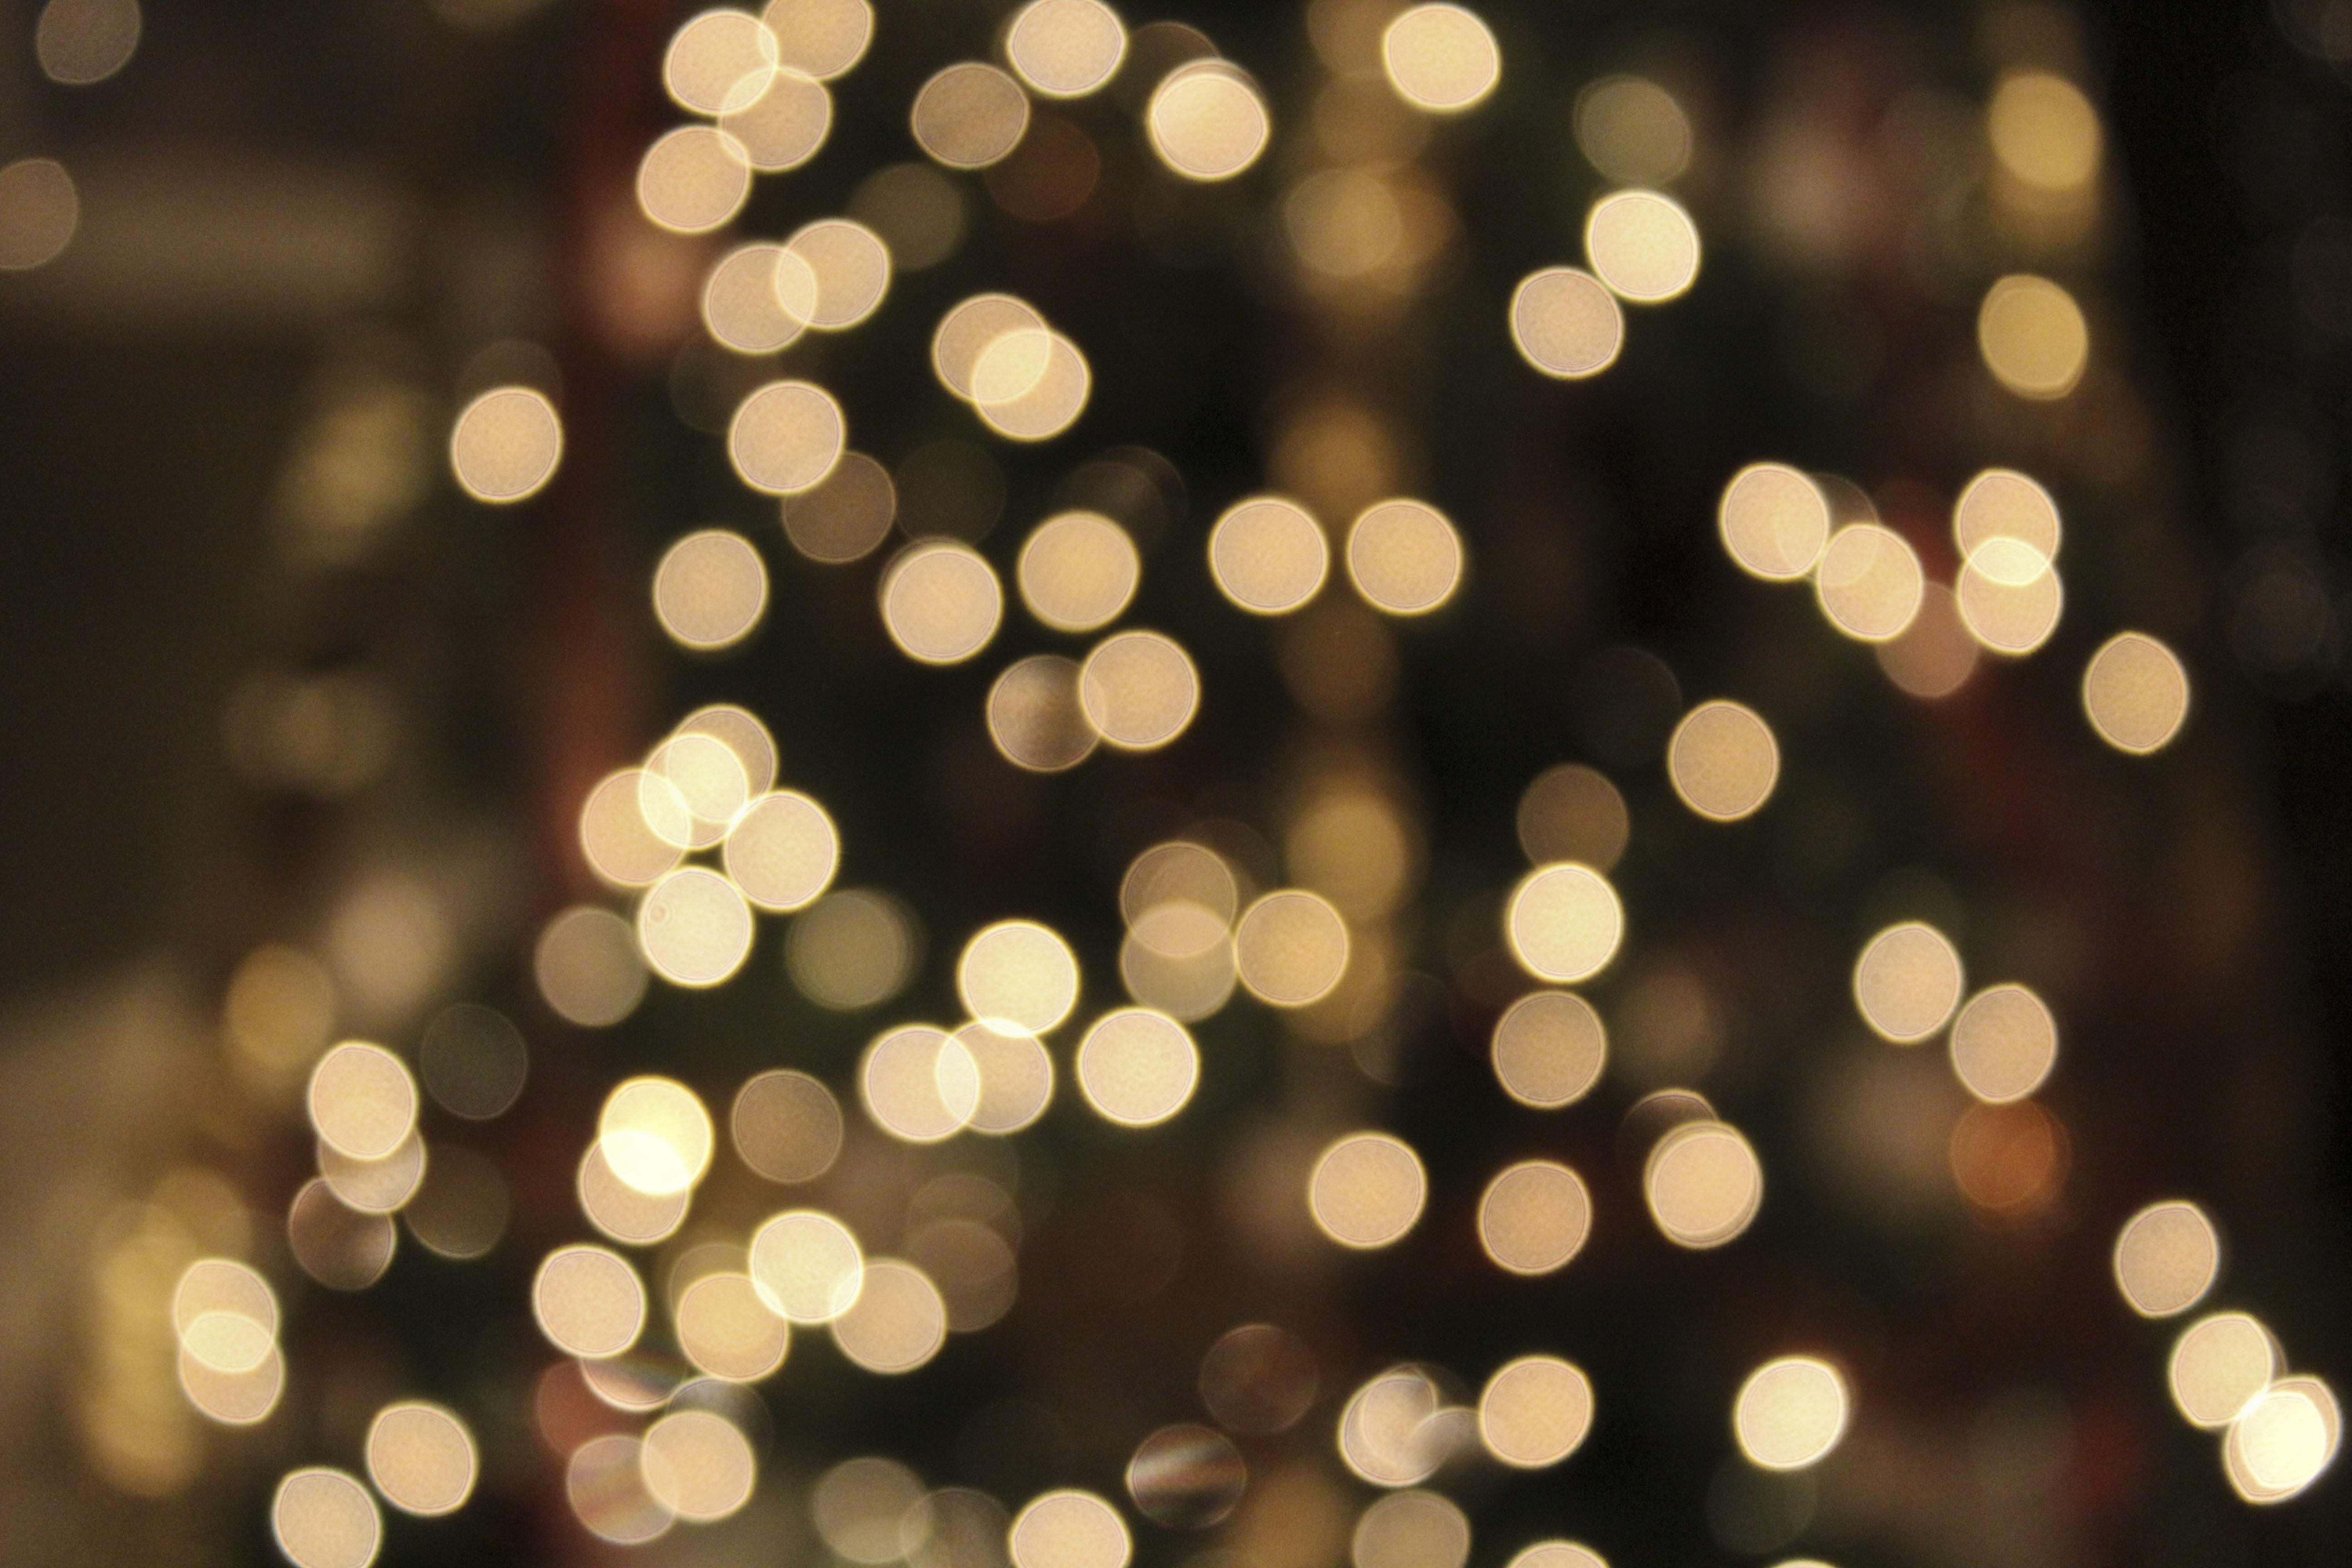 blurry christmas lights merry - photo #28